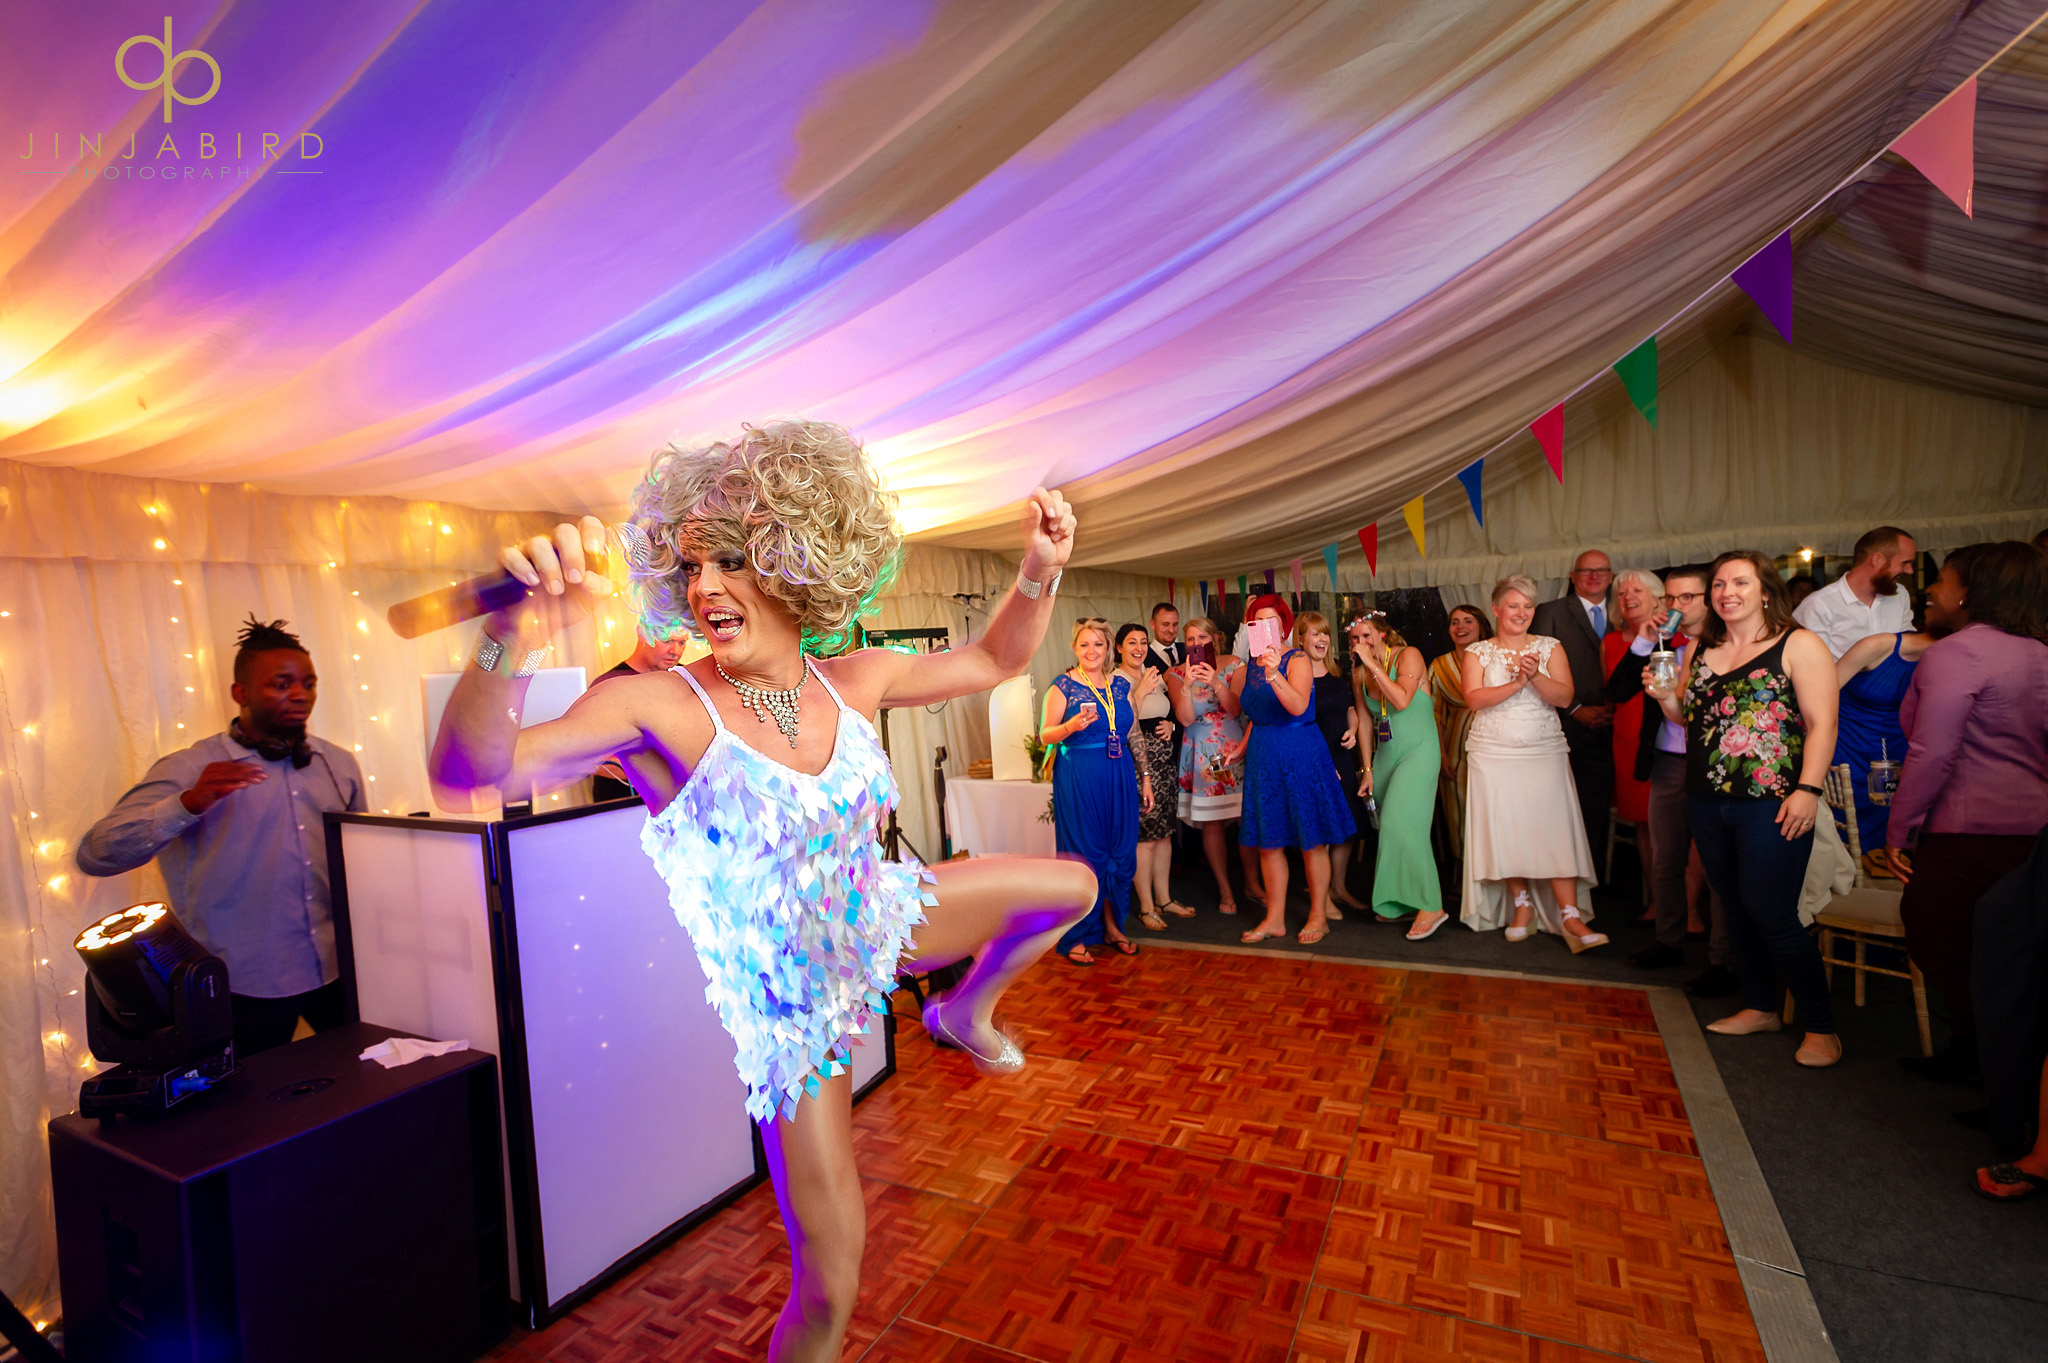 drag act at wedding bedford